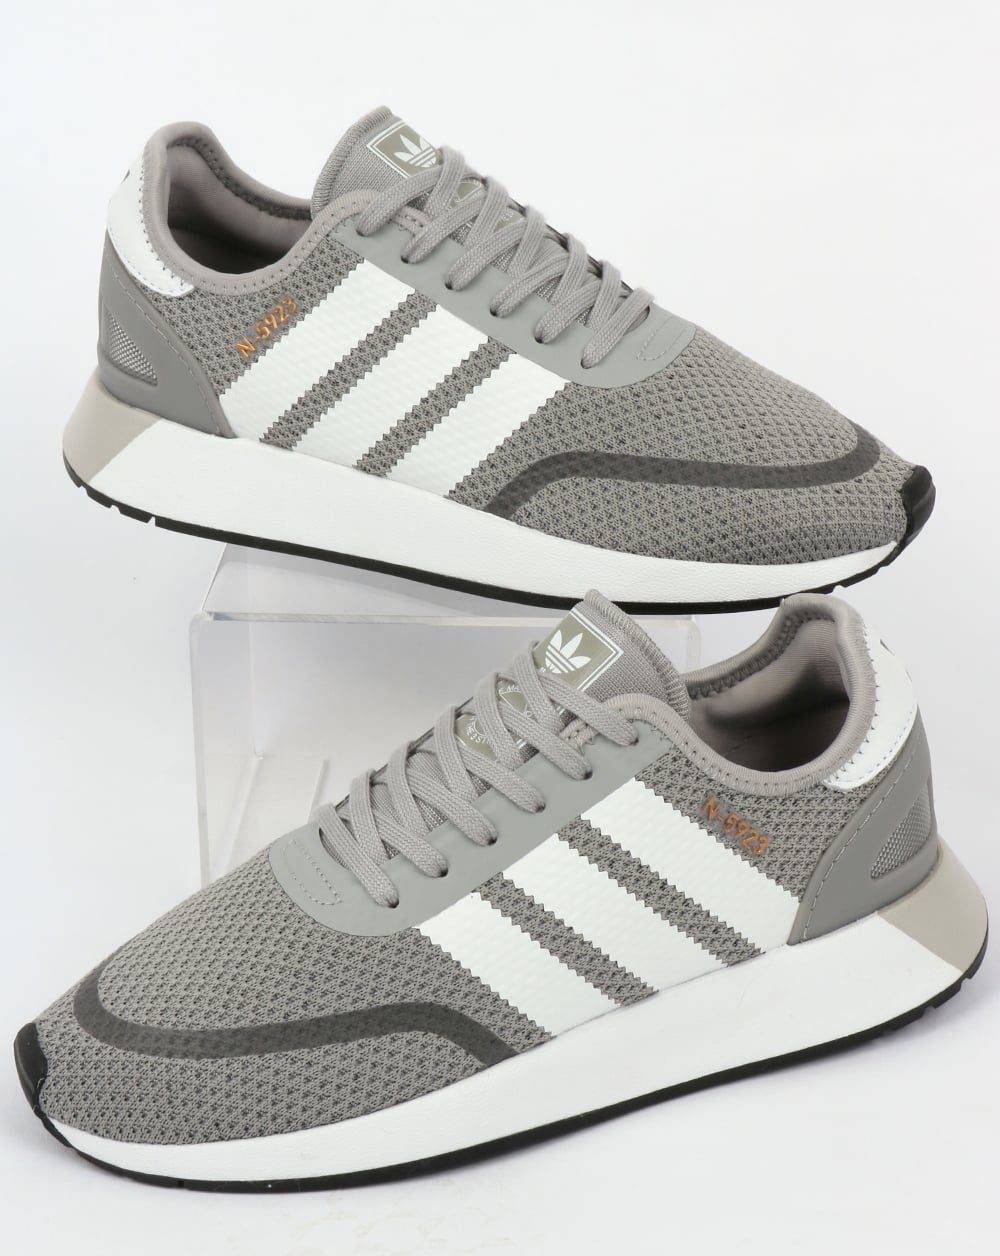 Adidas N 5923 Trainers Solid GreyWhite